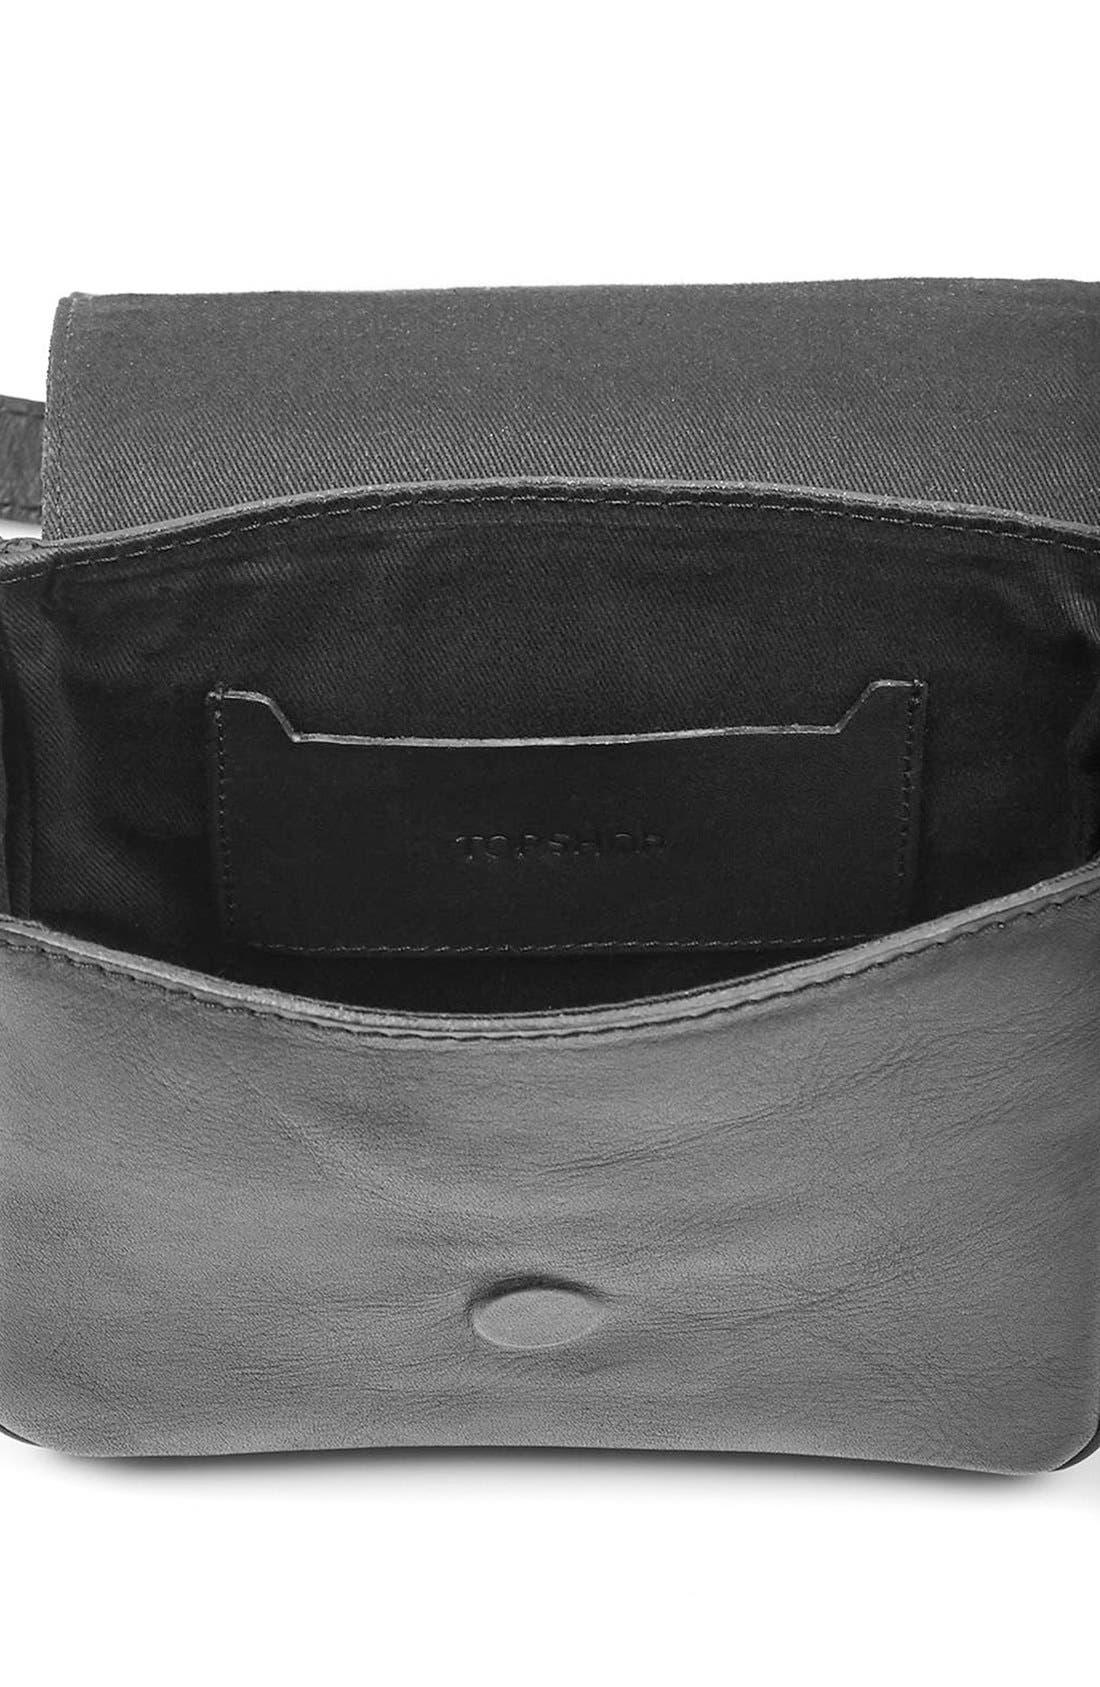 Alternate Image 4  - Topshop 'Rodeo' Studded Leather Crossbody Bag